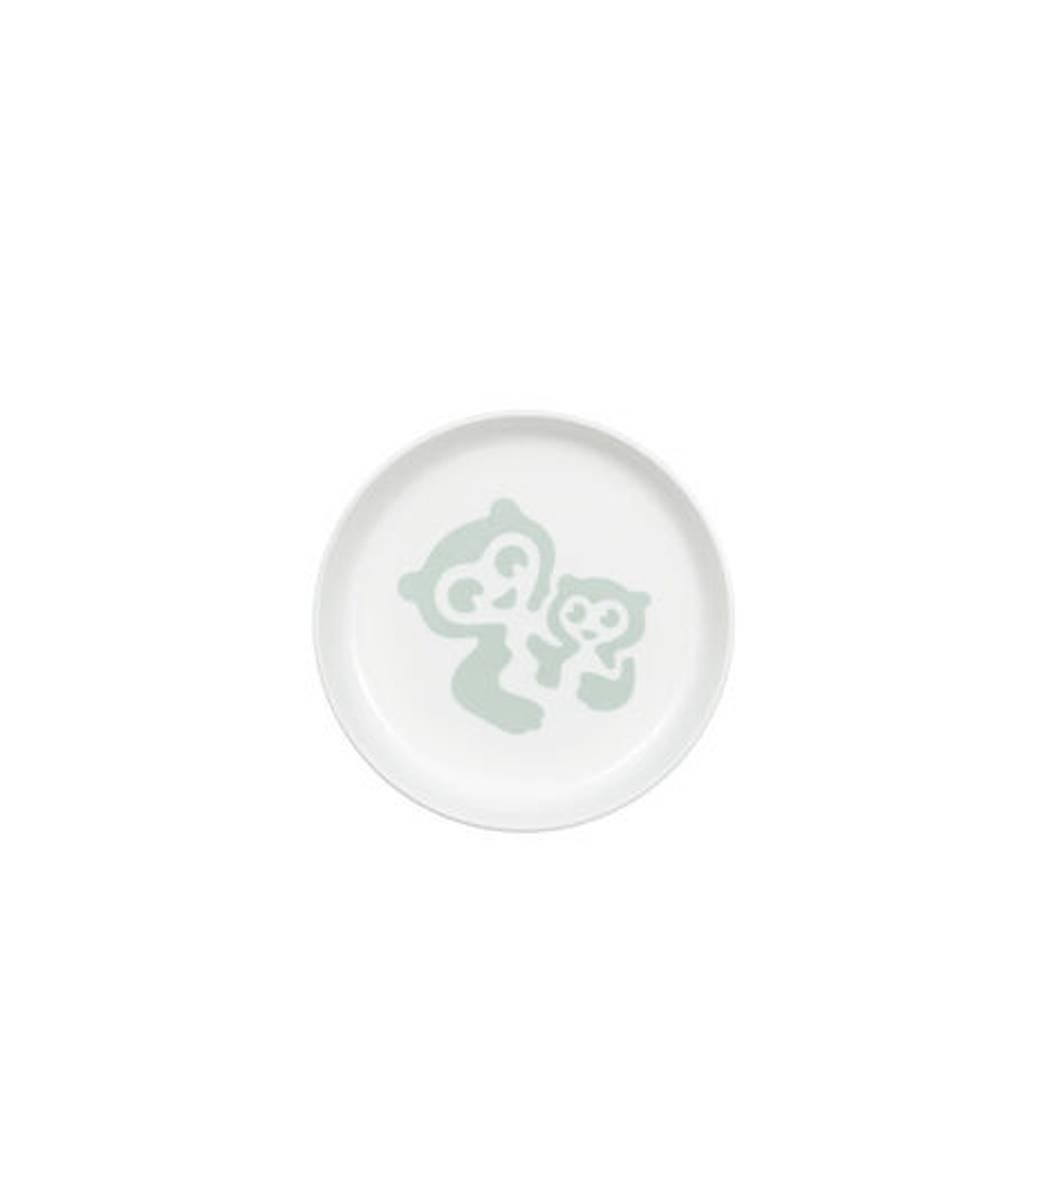 Stokke MUNCH Servise Everyday | Soft Mint